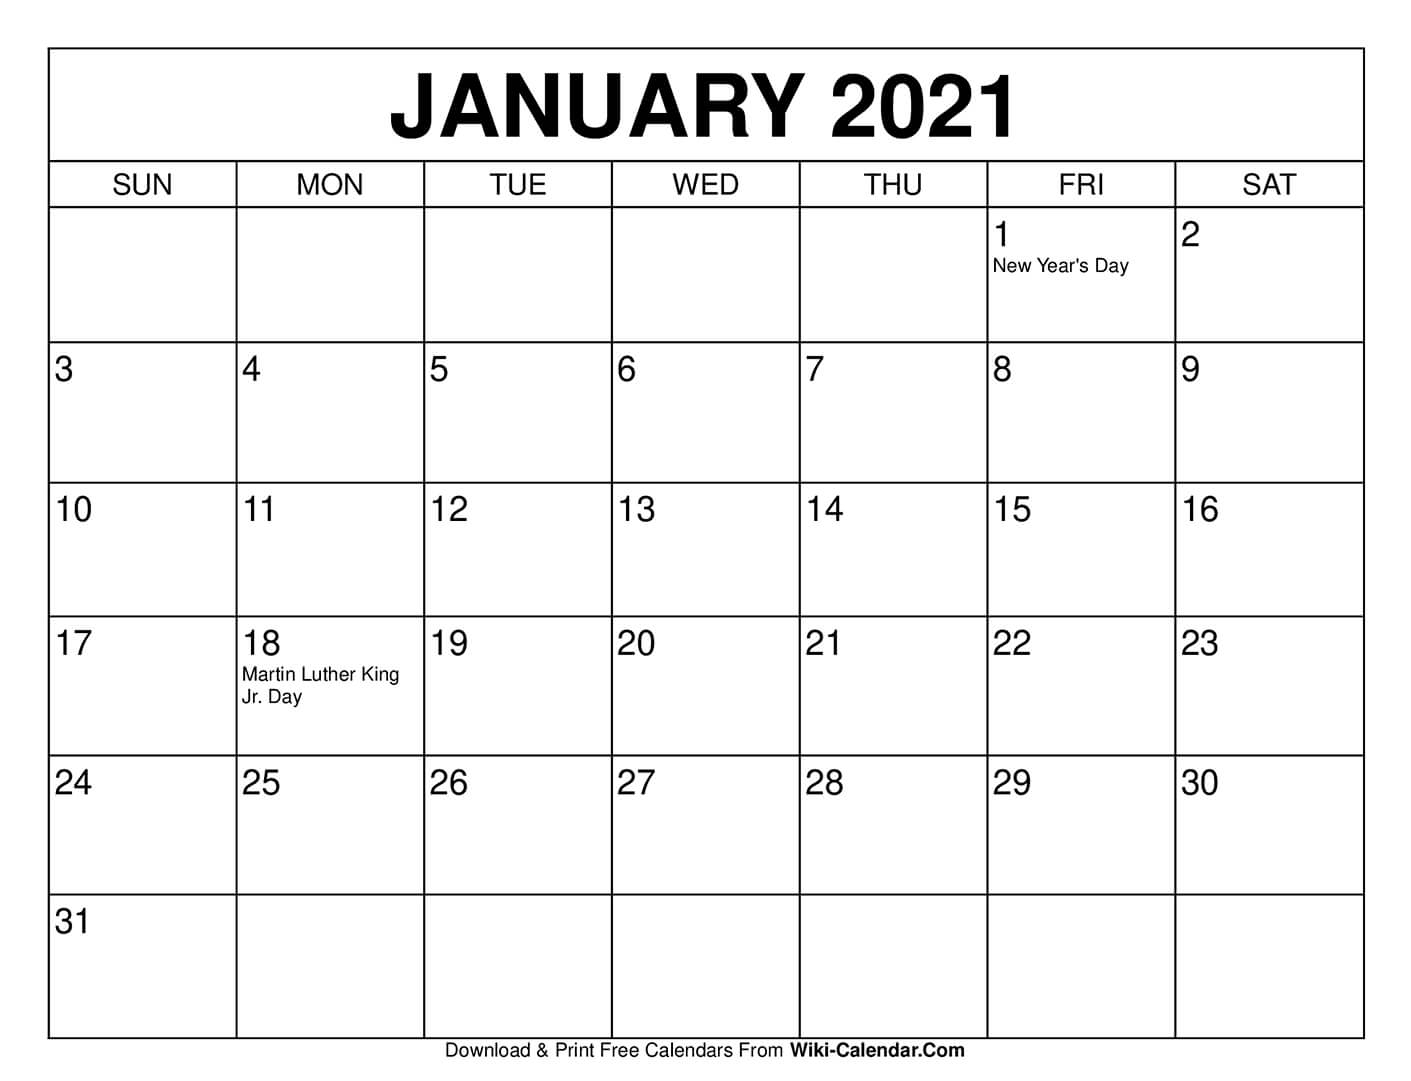 Free Printable January 2021 Calendars 1